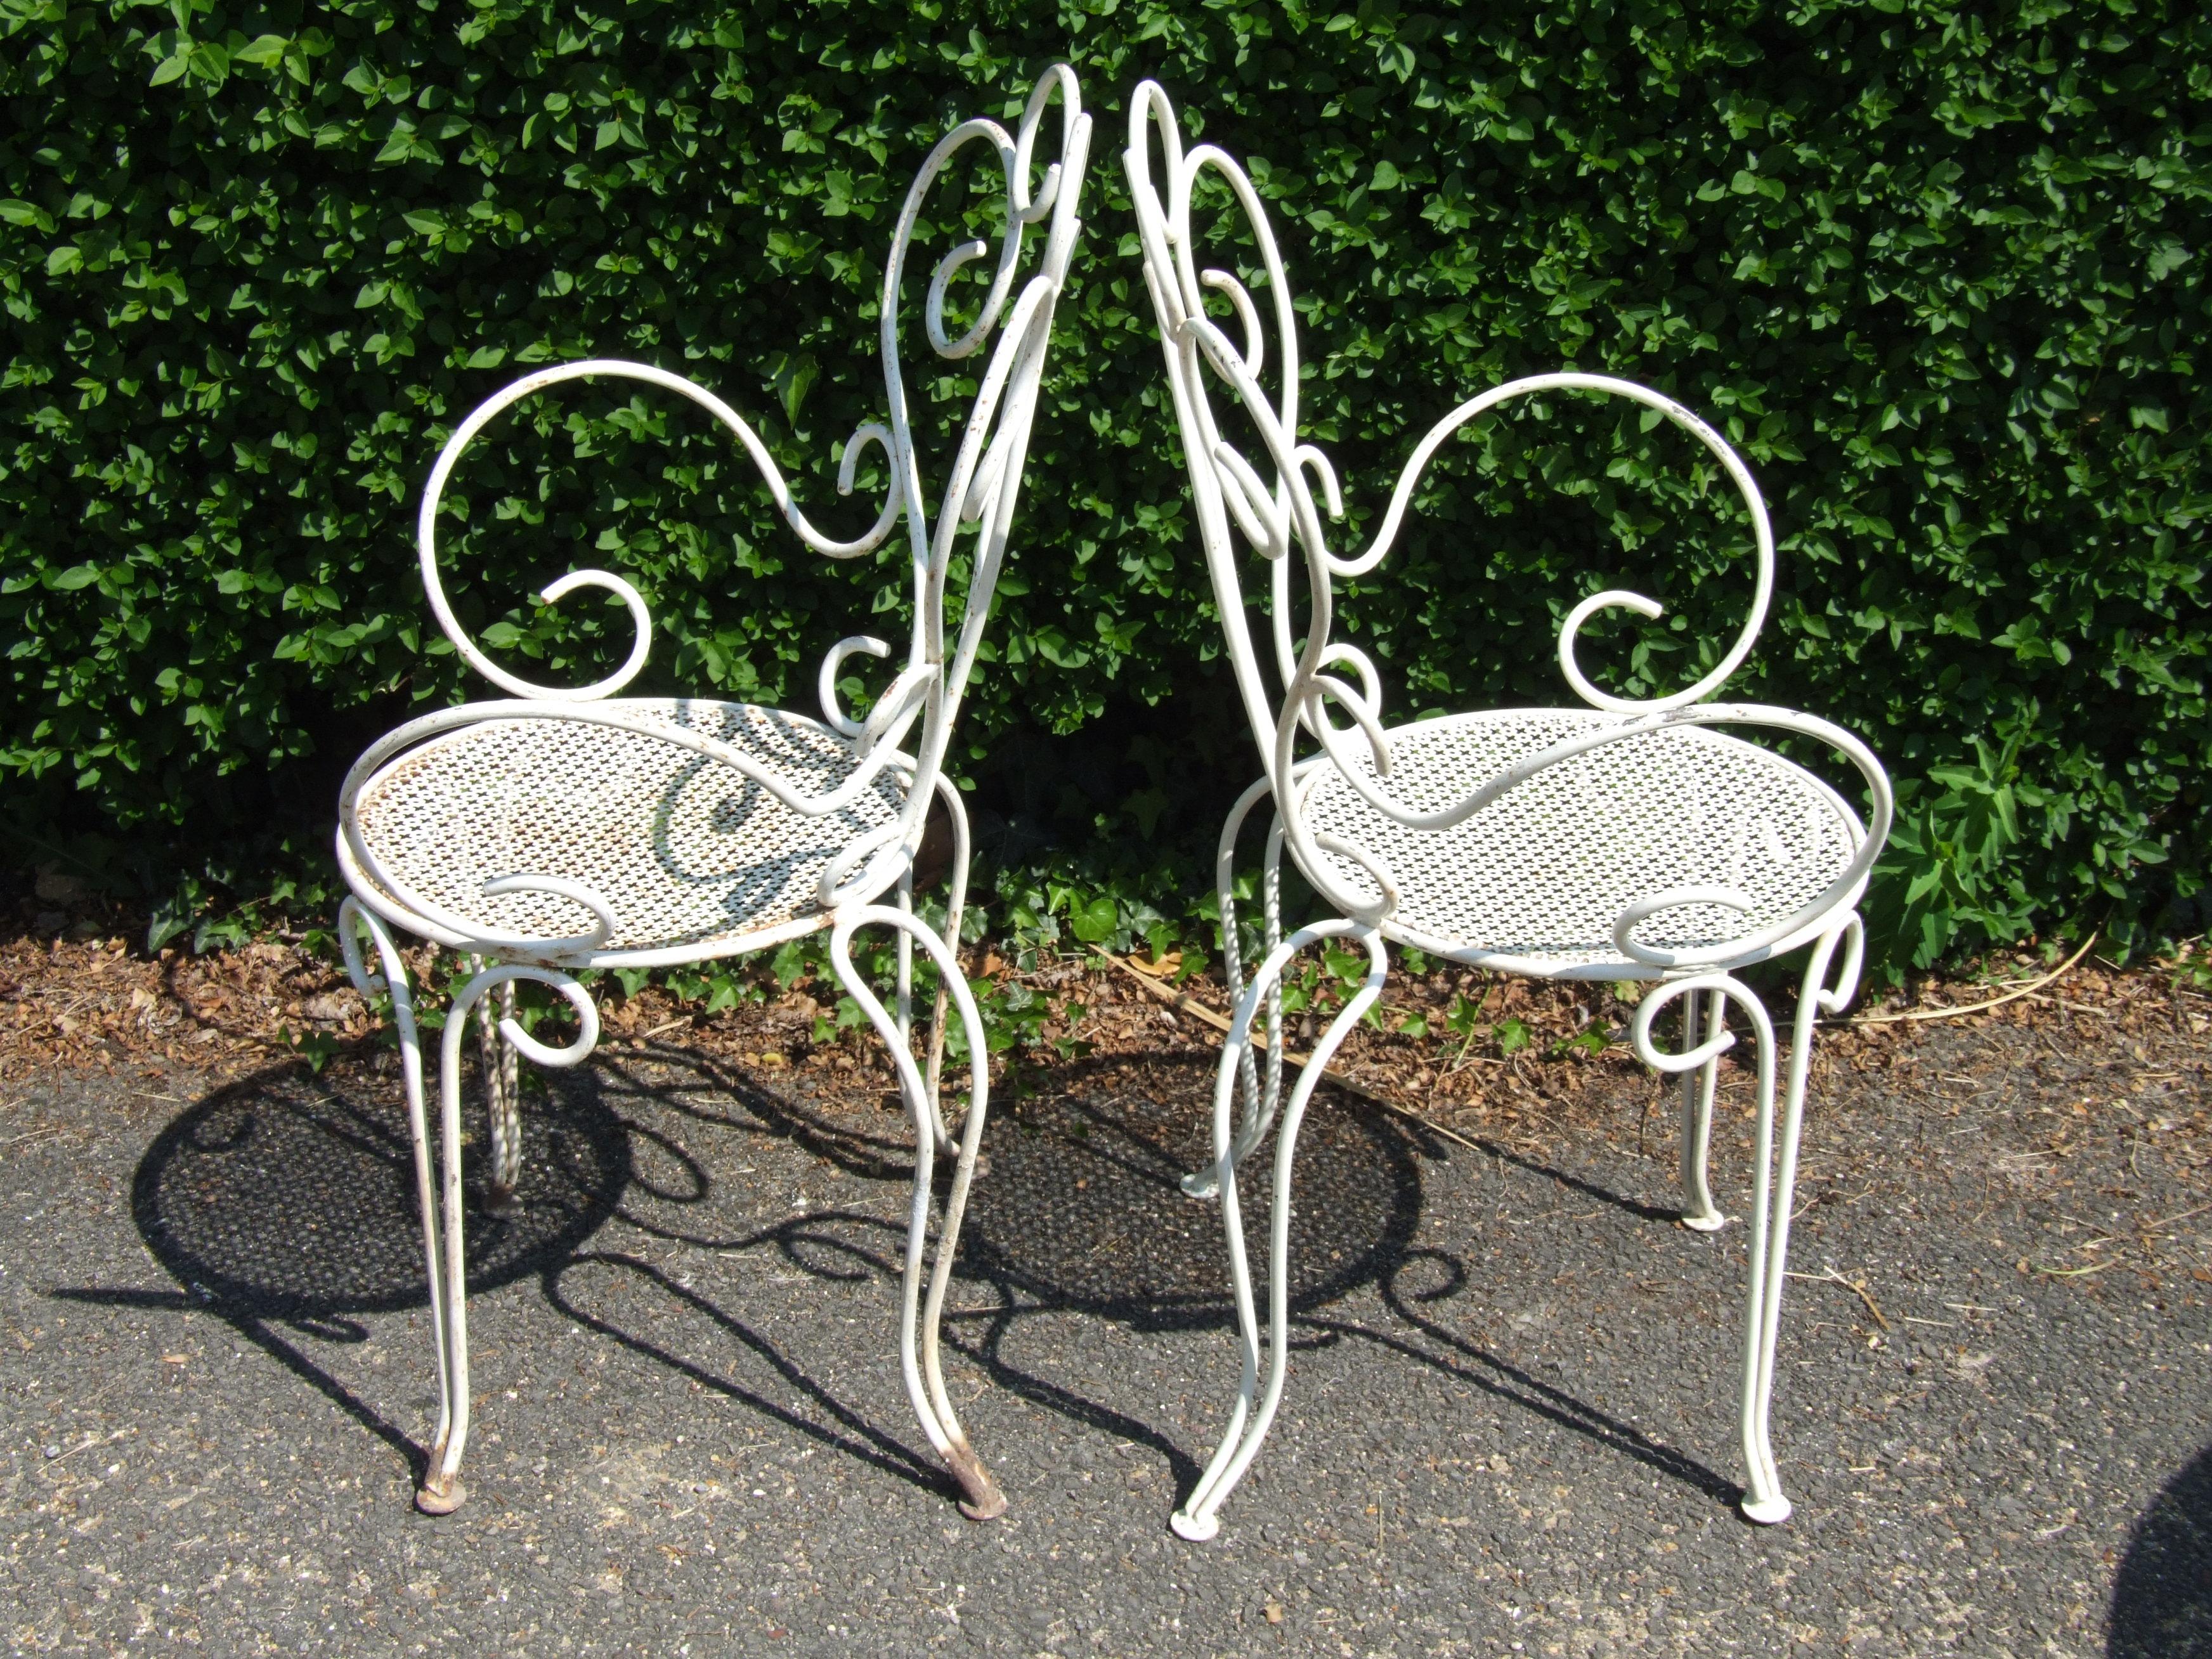 metal garden chairs wrought iron chairs australia folding chair wrought iron outdoor throughout metal TNFXELW